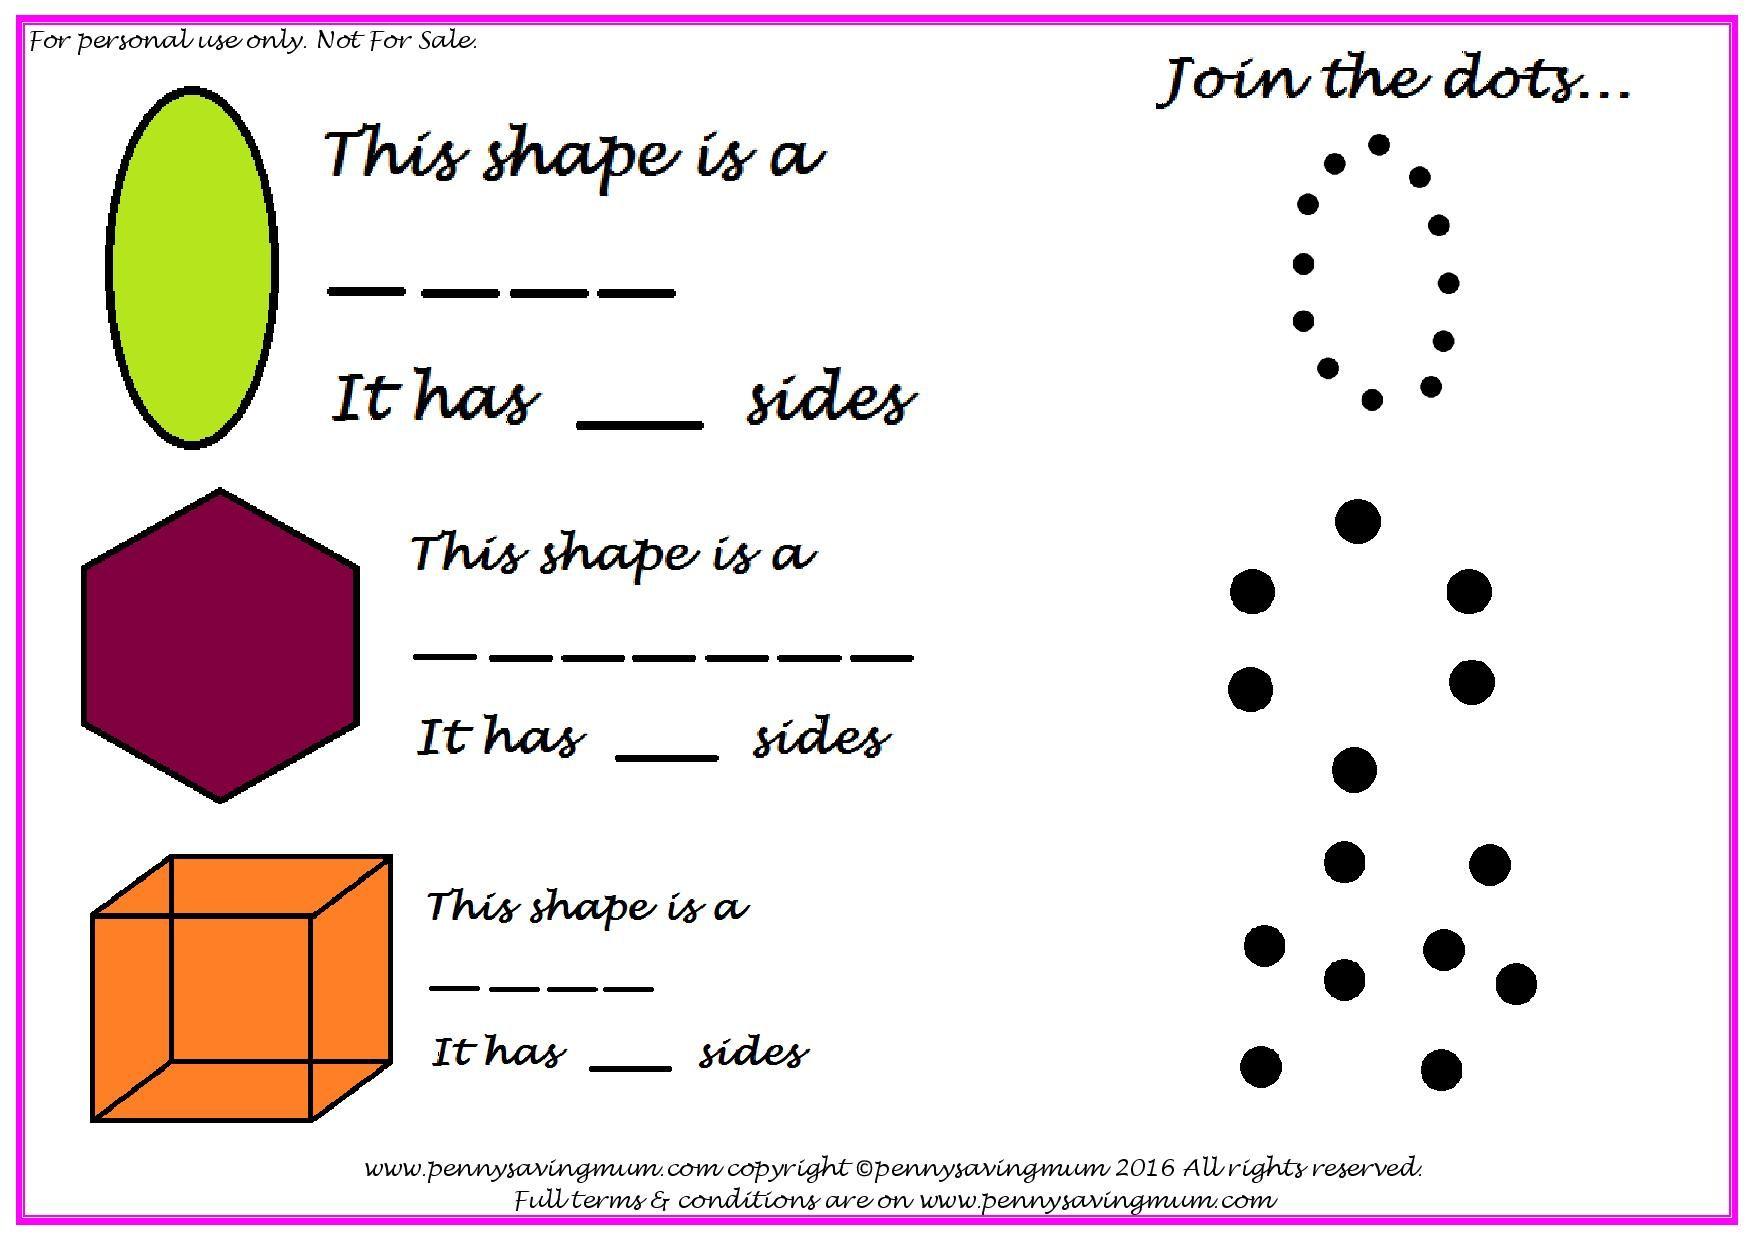 Shapes Pack PDF Shapes, Saving, Penny